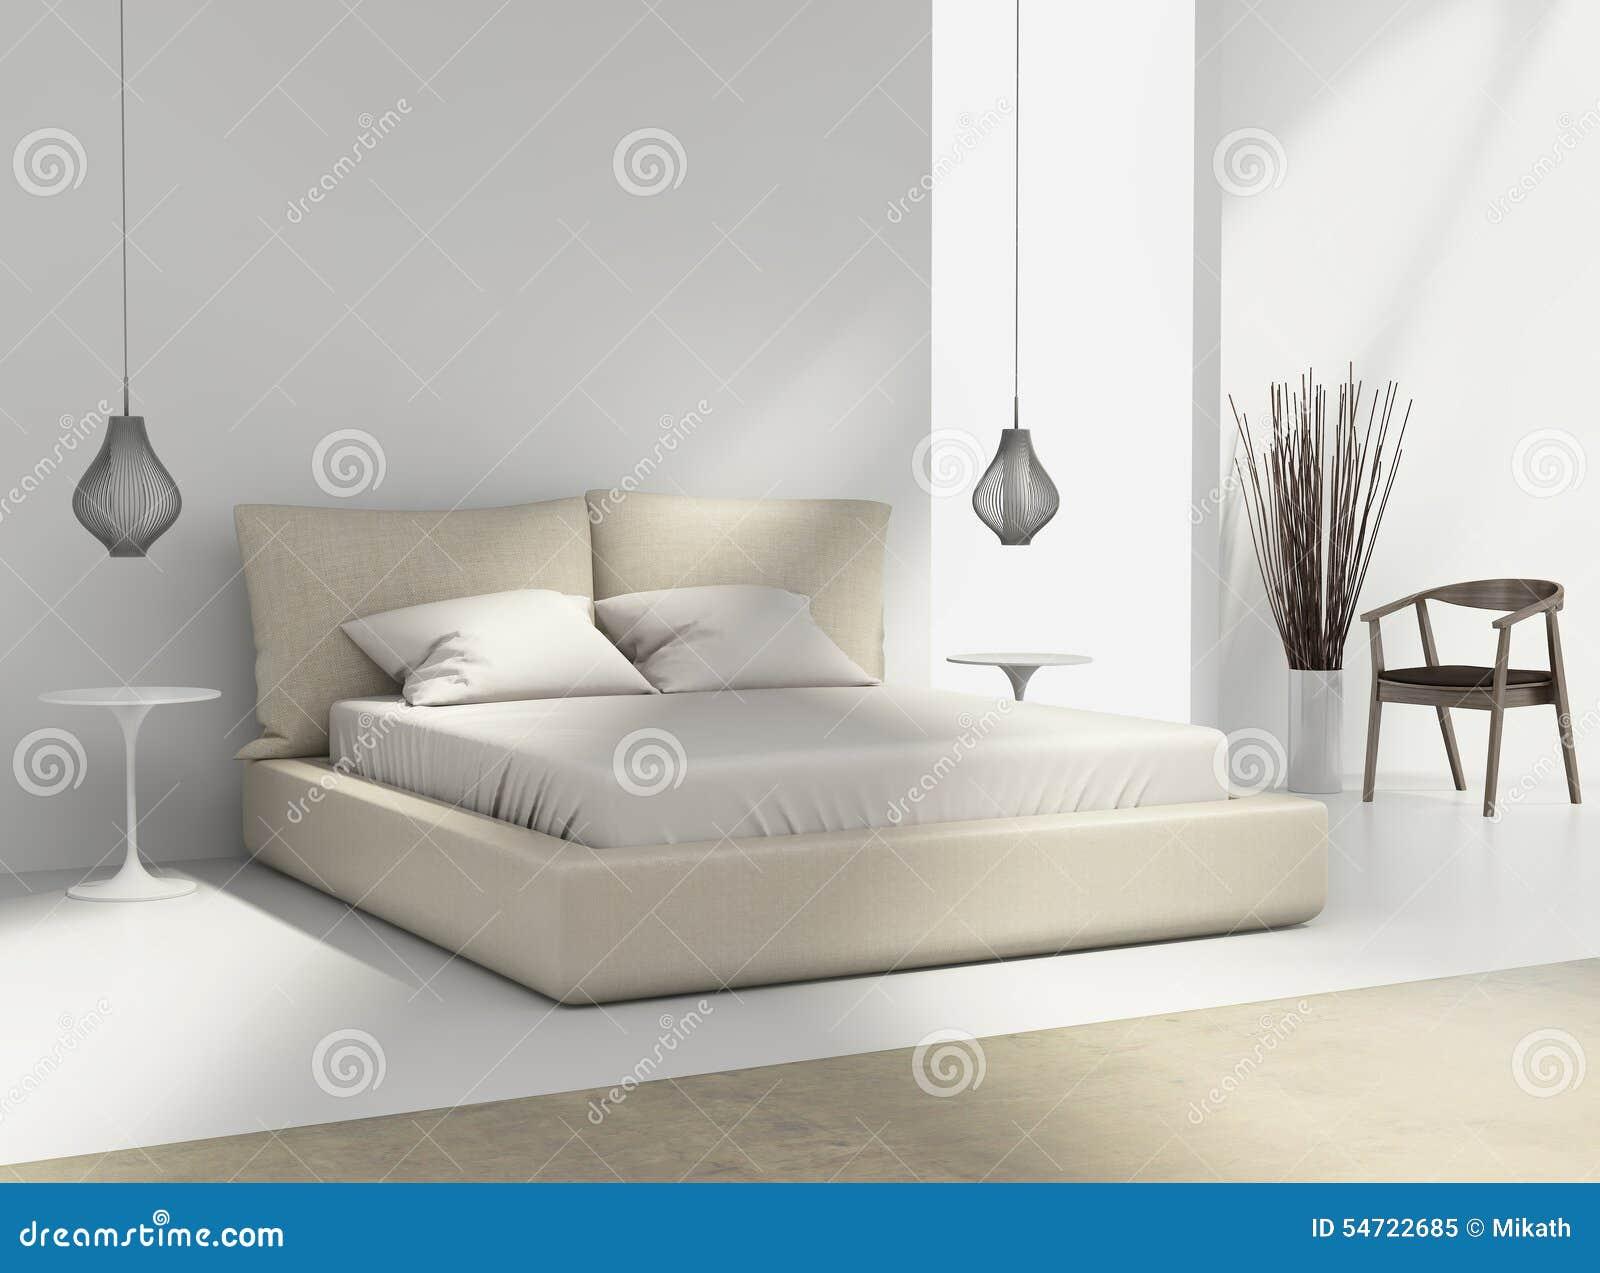 http://thumbs.dreamstime.com/z/witte-en-beige-slaapkamer-met-stoel-en-lampen-54722685.jpg